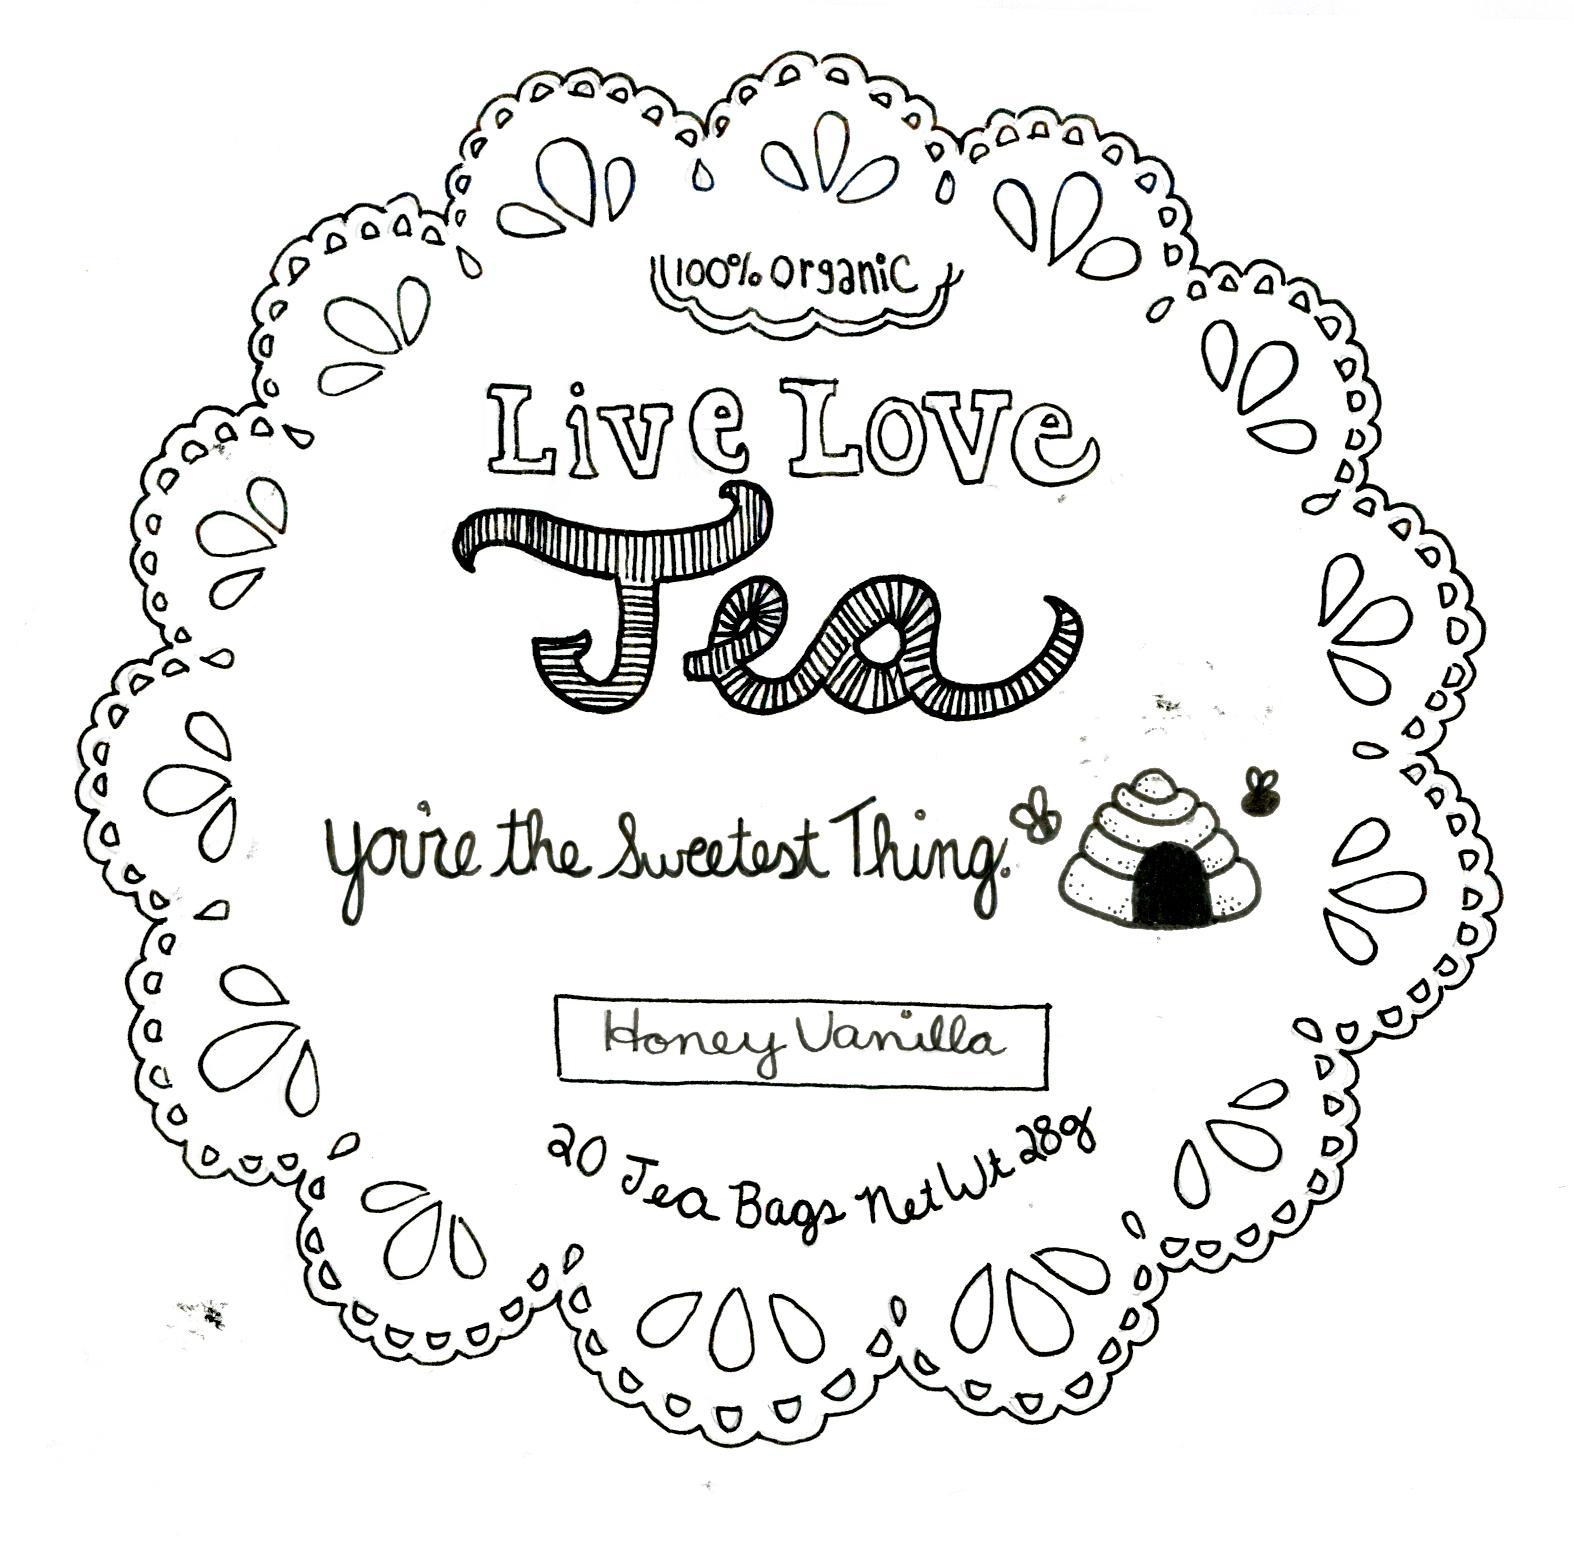 Live.Love.Tea. - image 21 - student project